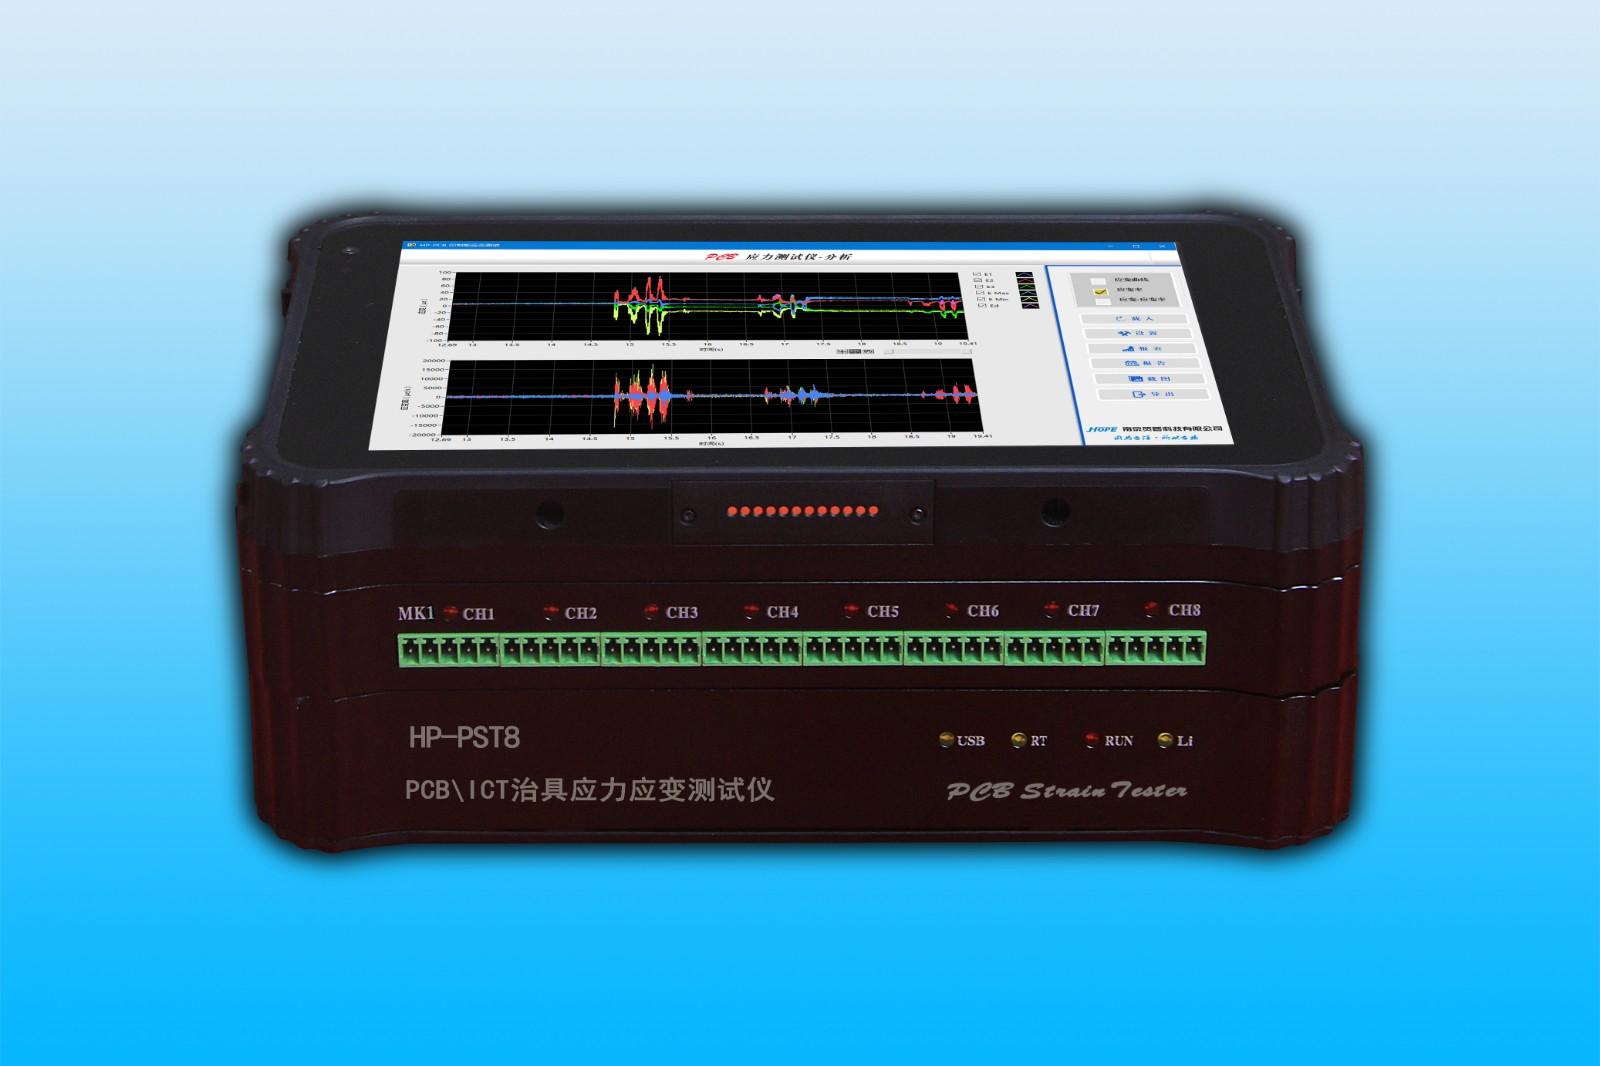 HP-PST8 印制板优发国际顶级在线应变测试仪